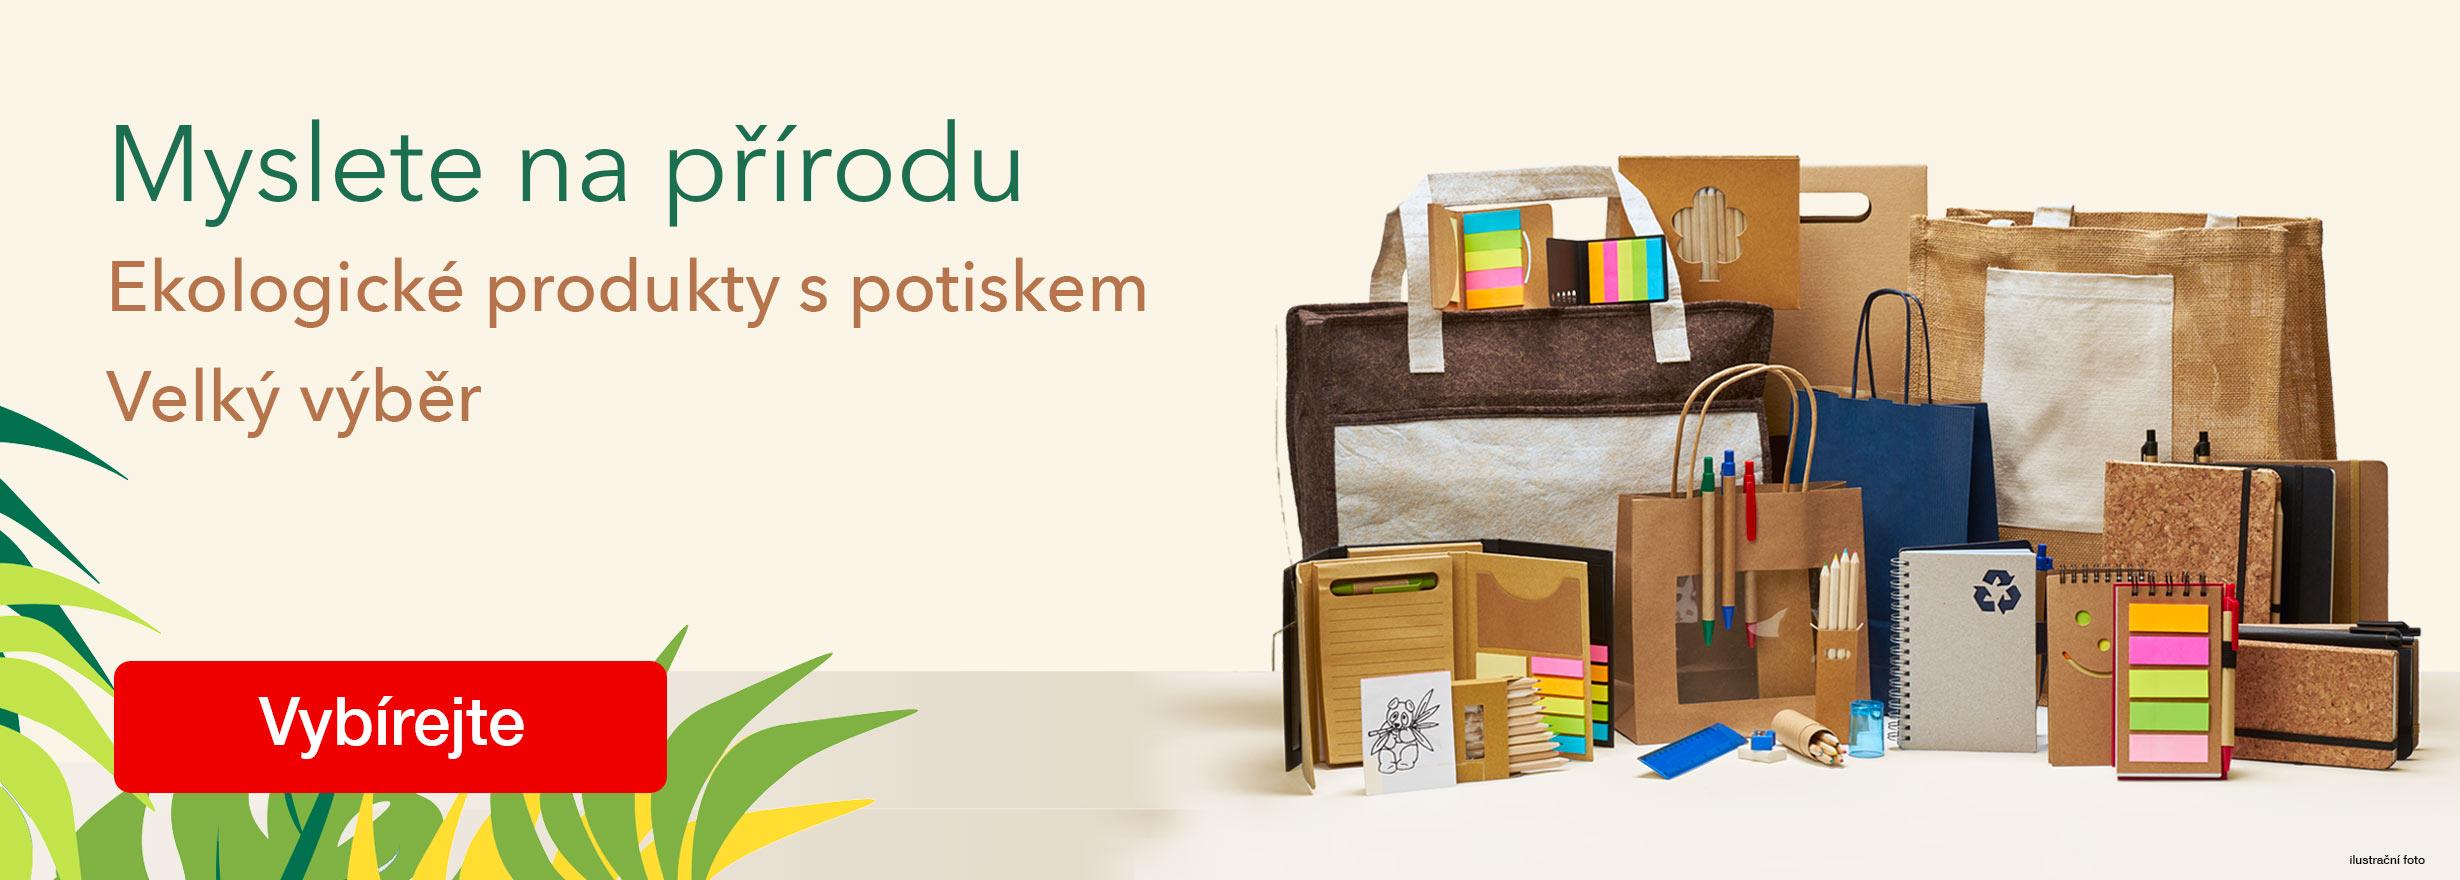 Eko produkty